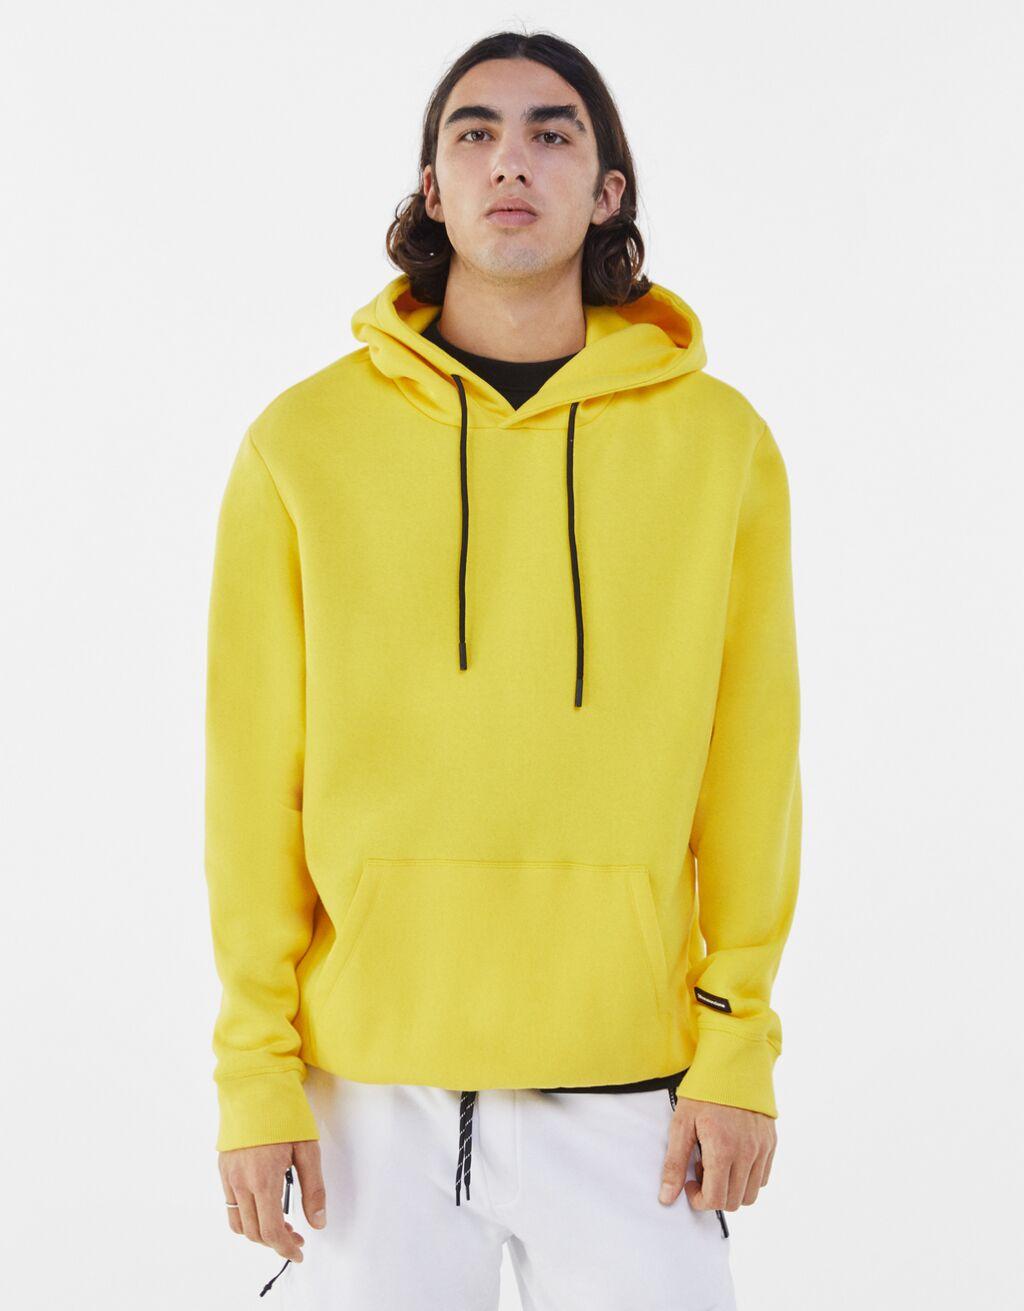 Sudadera color amarillo con capucha